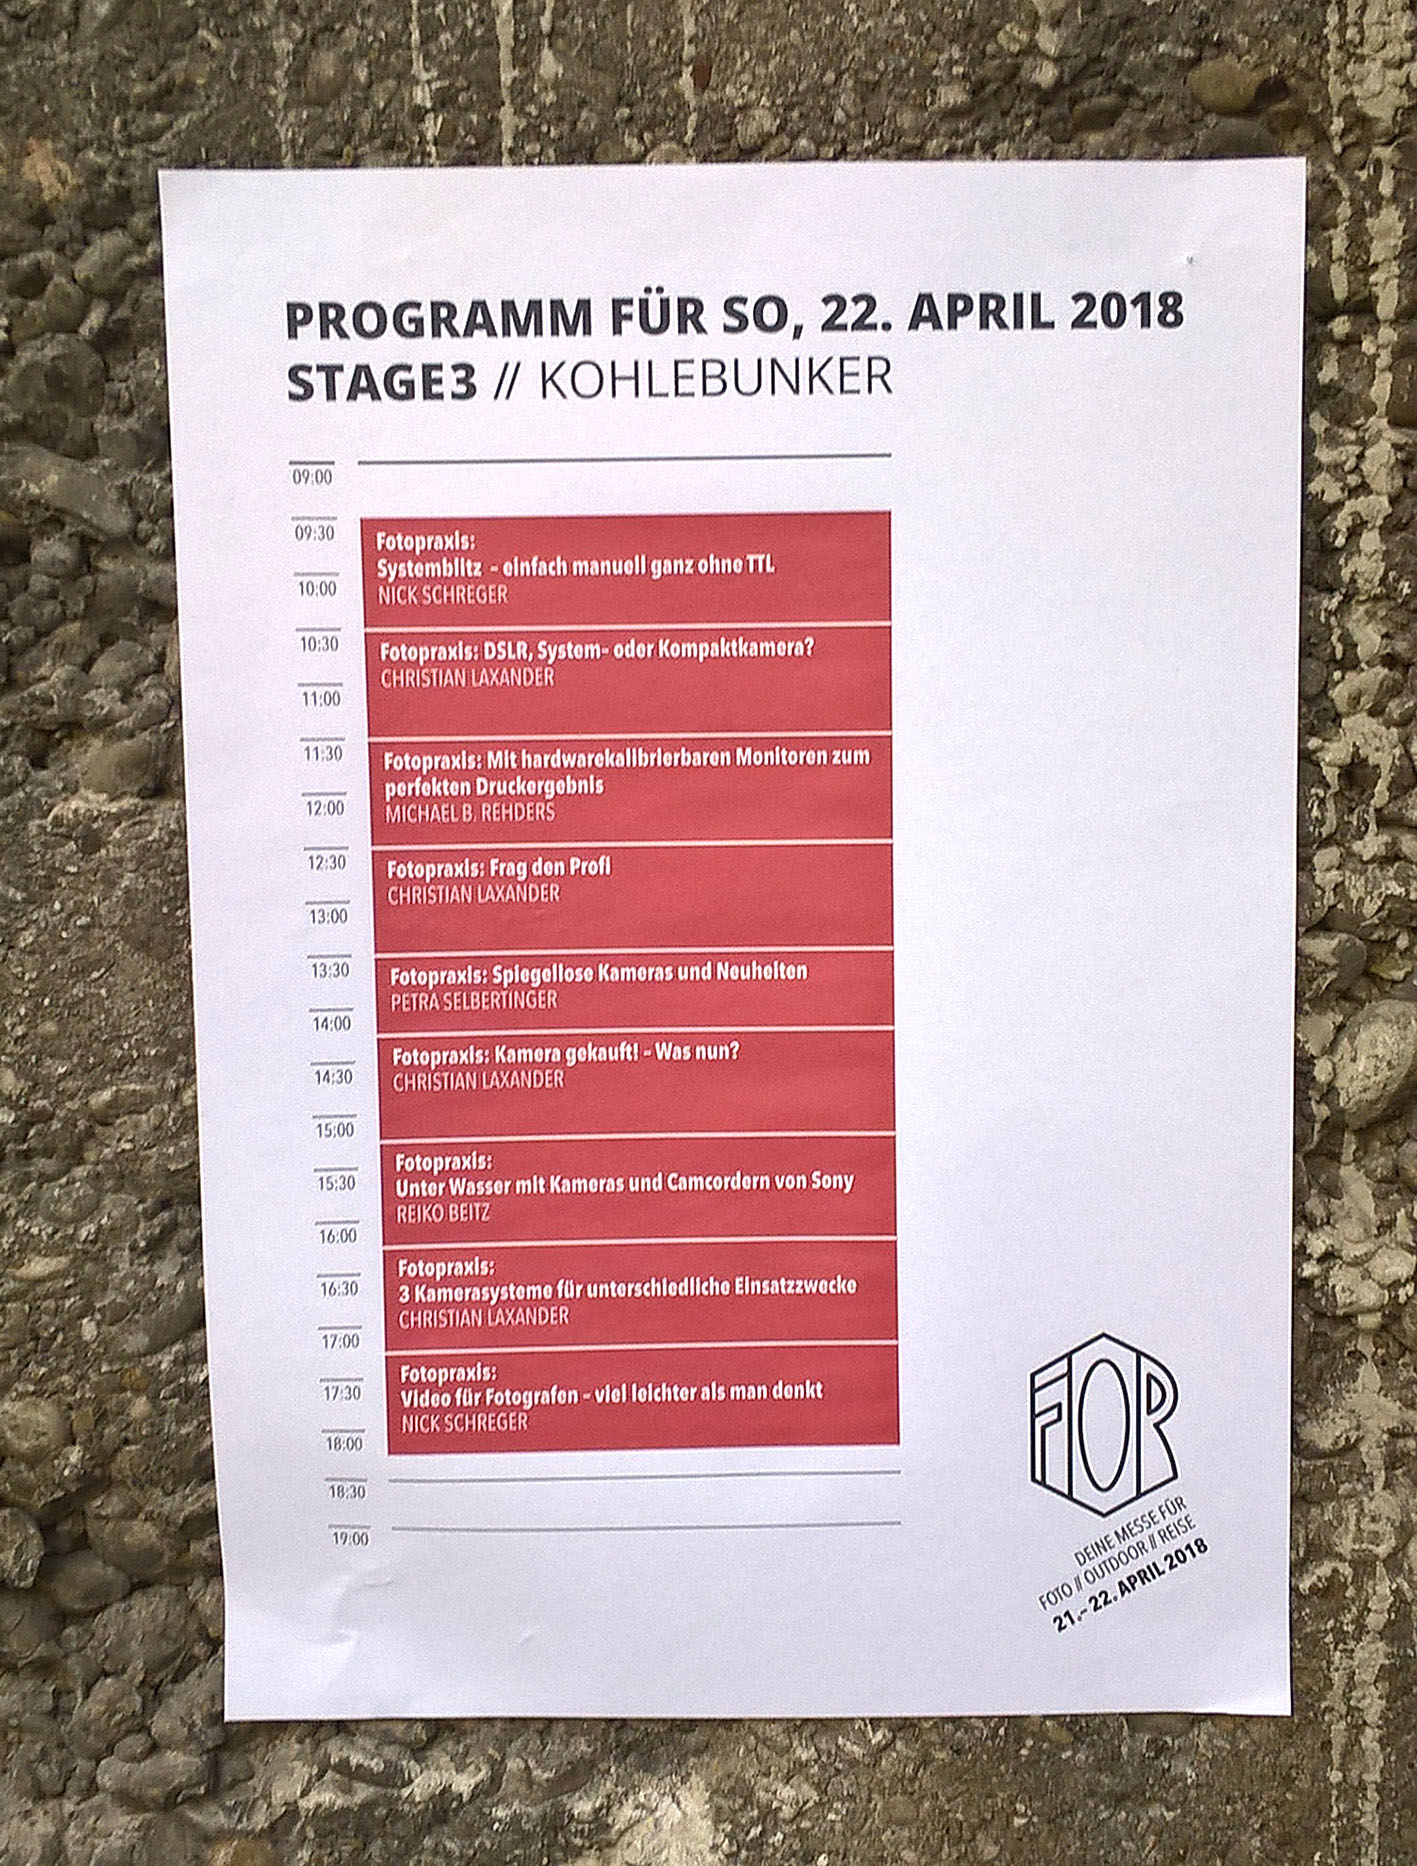 FOR - Aushang - Foto Michael B. Rehders - München 2018